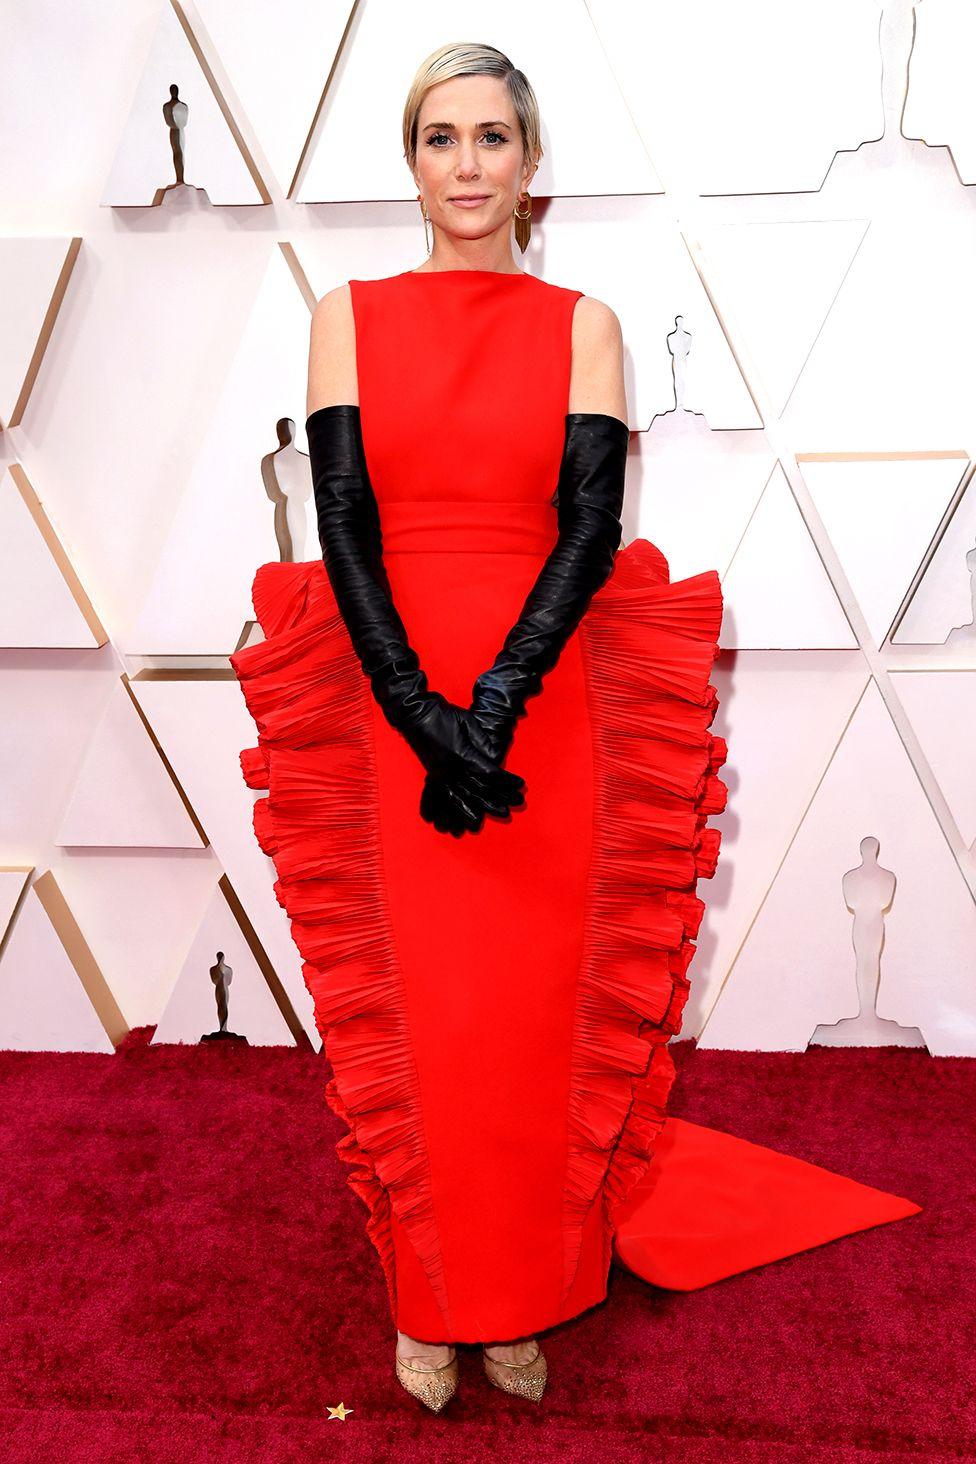 Kristen Wiig on the red carpet